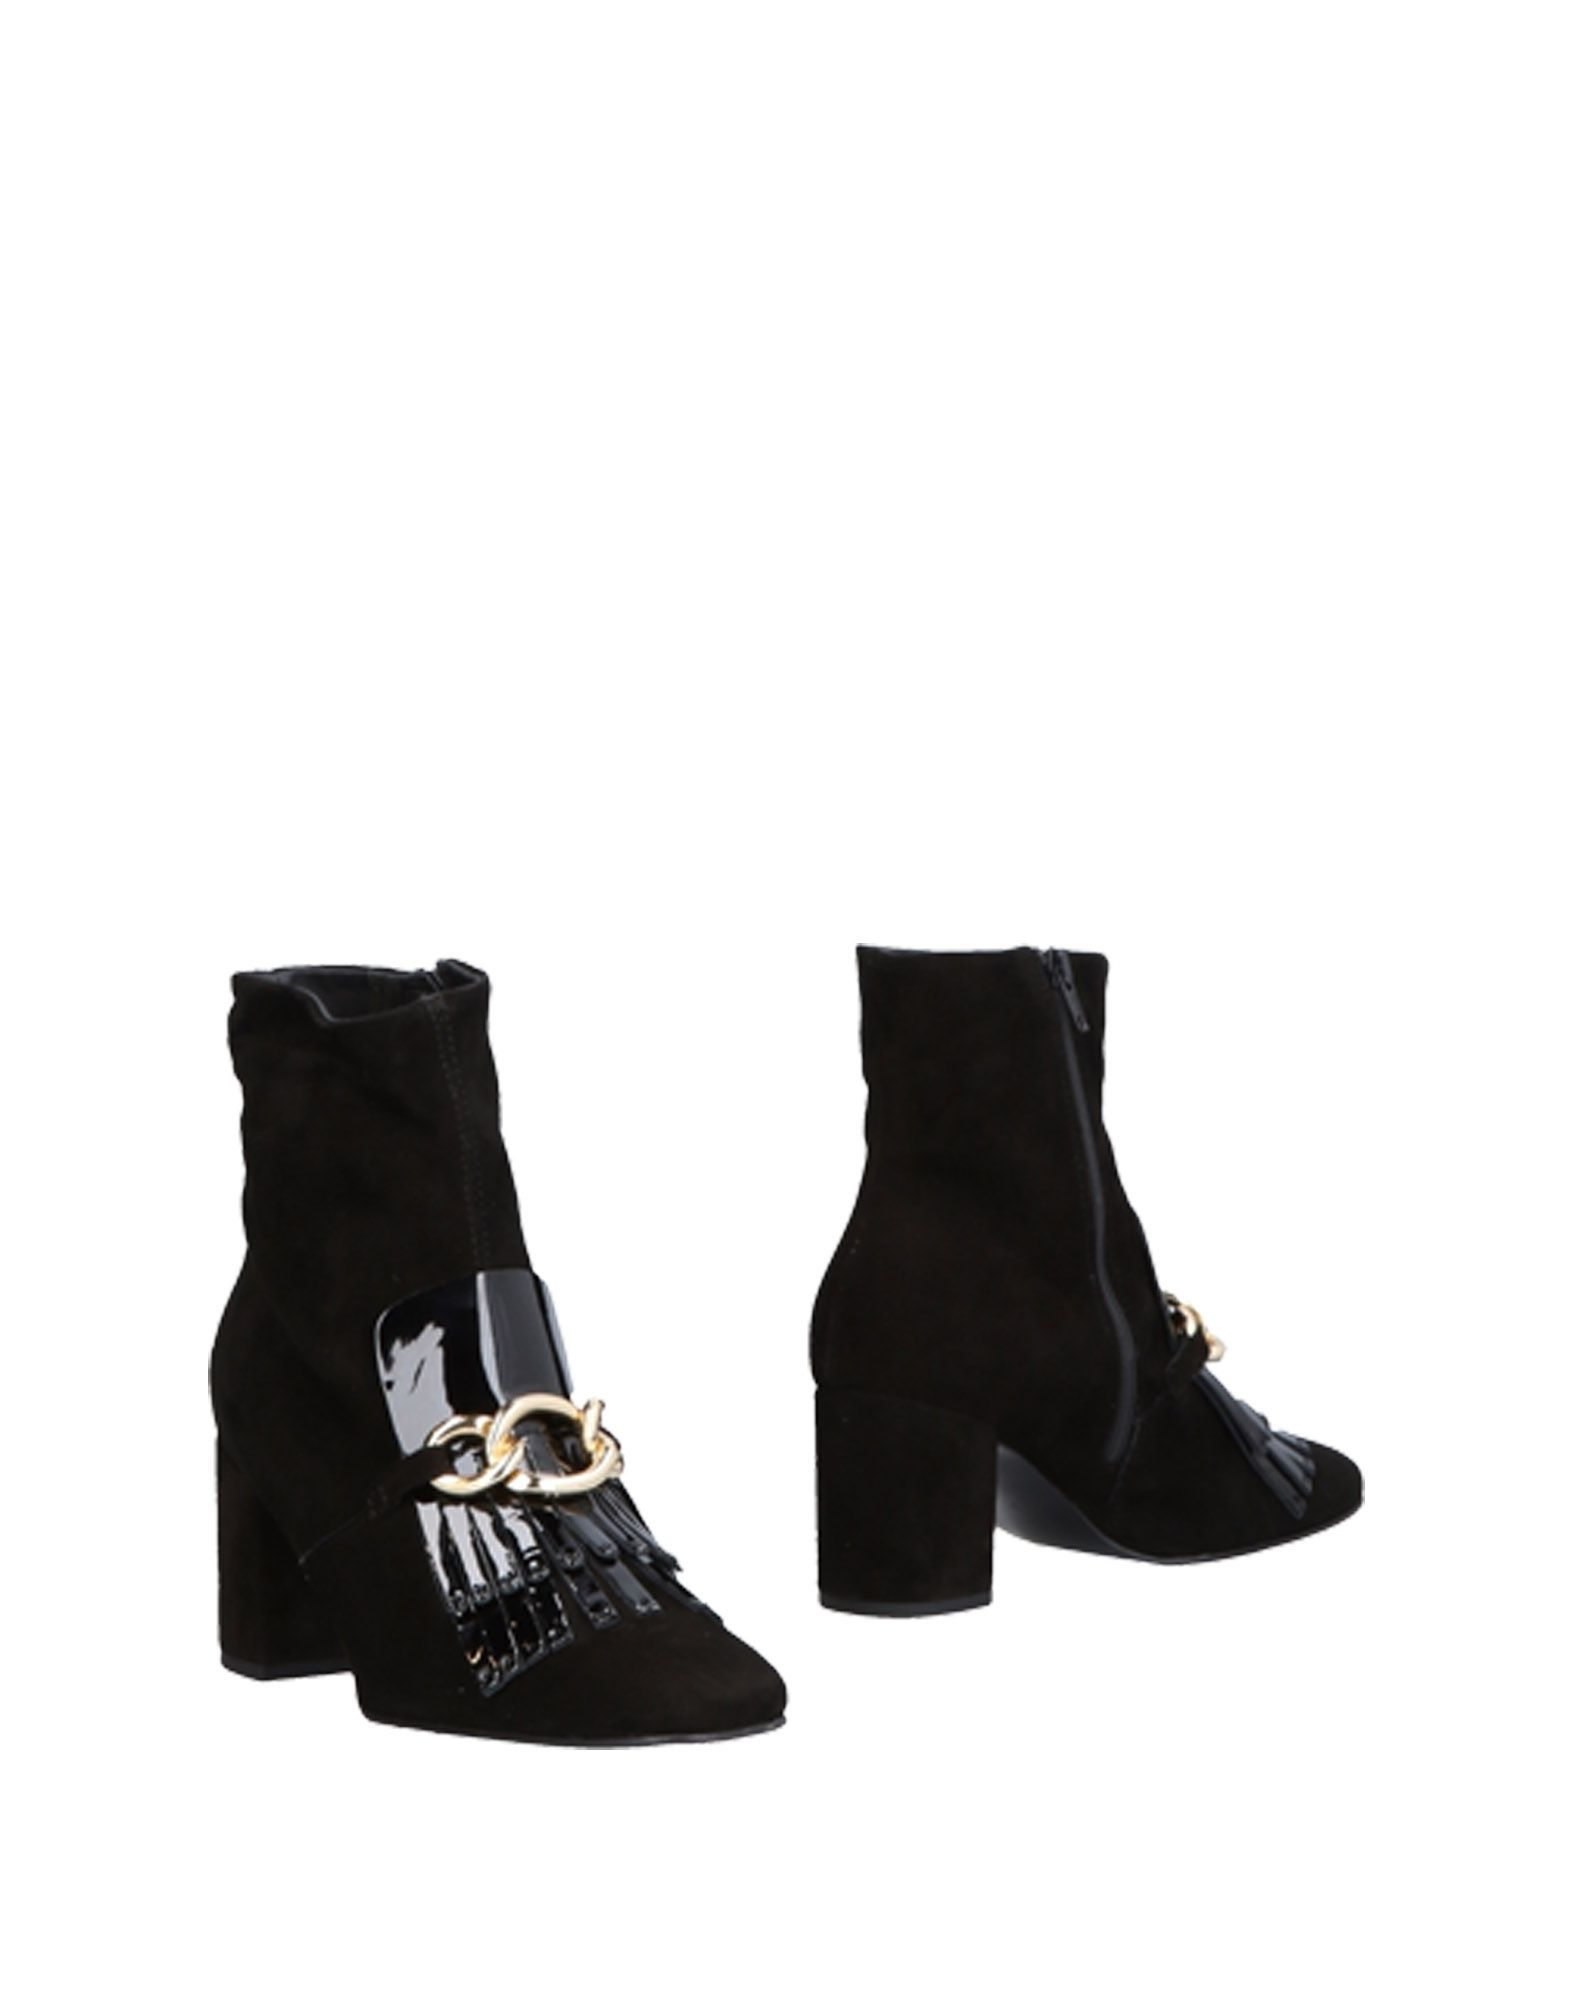 TOSCA BLU SHOES Полусапоги и высокие ботинки meotina women wedding shoes 2018 spring platform high heels shoes pumps peep toe bow white slip on sexy shoes ladies size 34 43